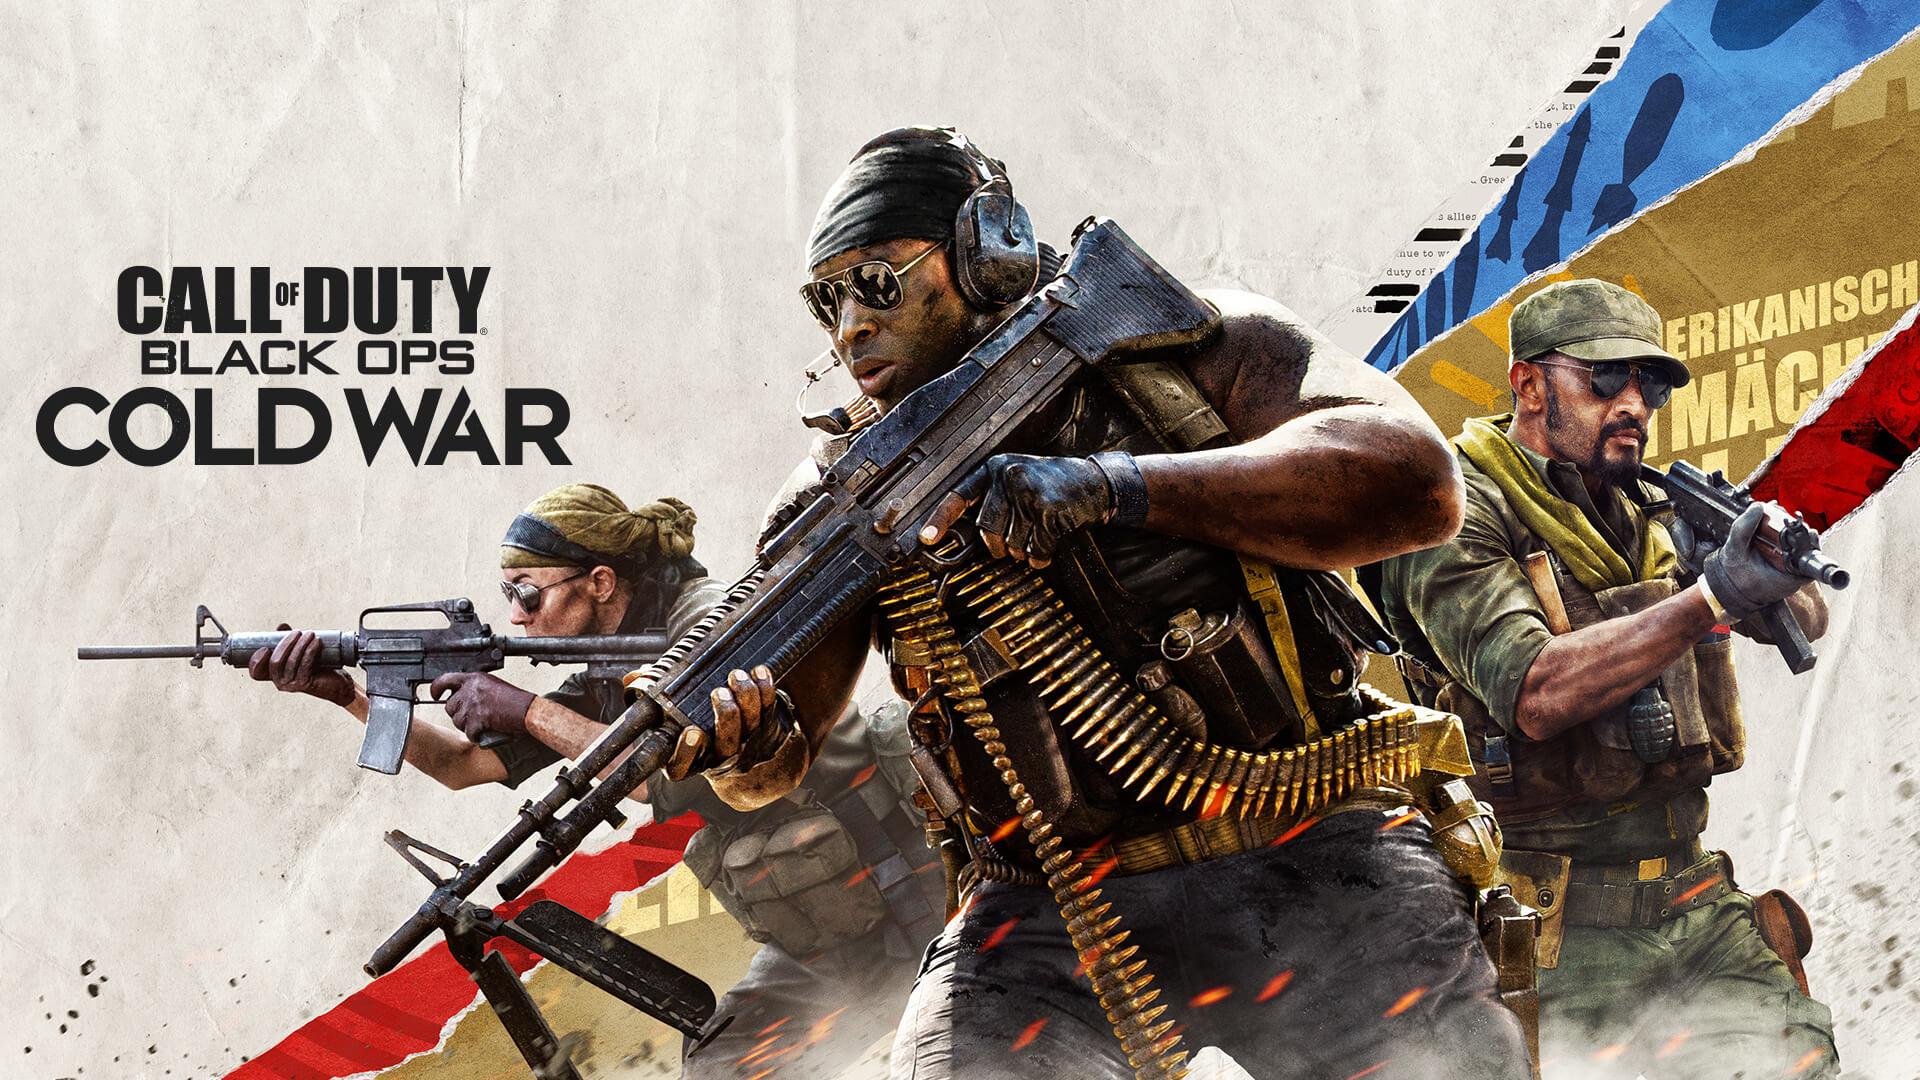 BOCold-War-Call-of-DutyTOUT